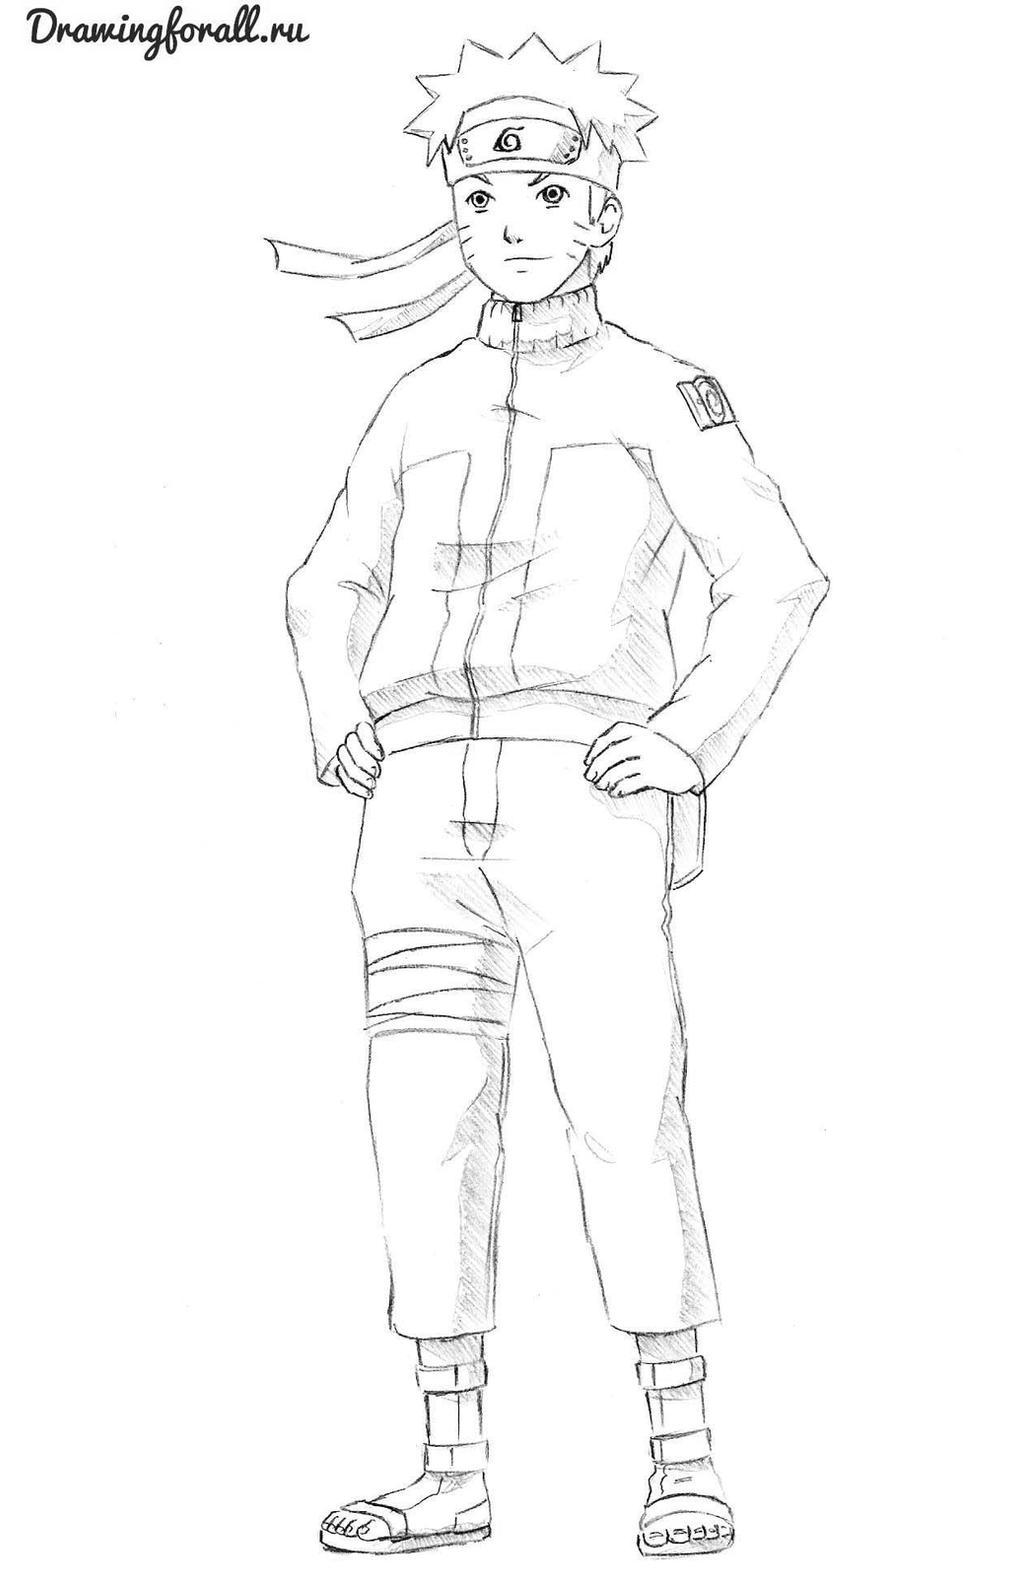 Naruto by SteveLegrand on DeviantArt